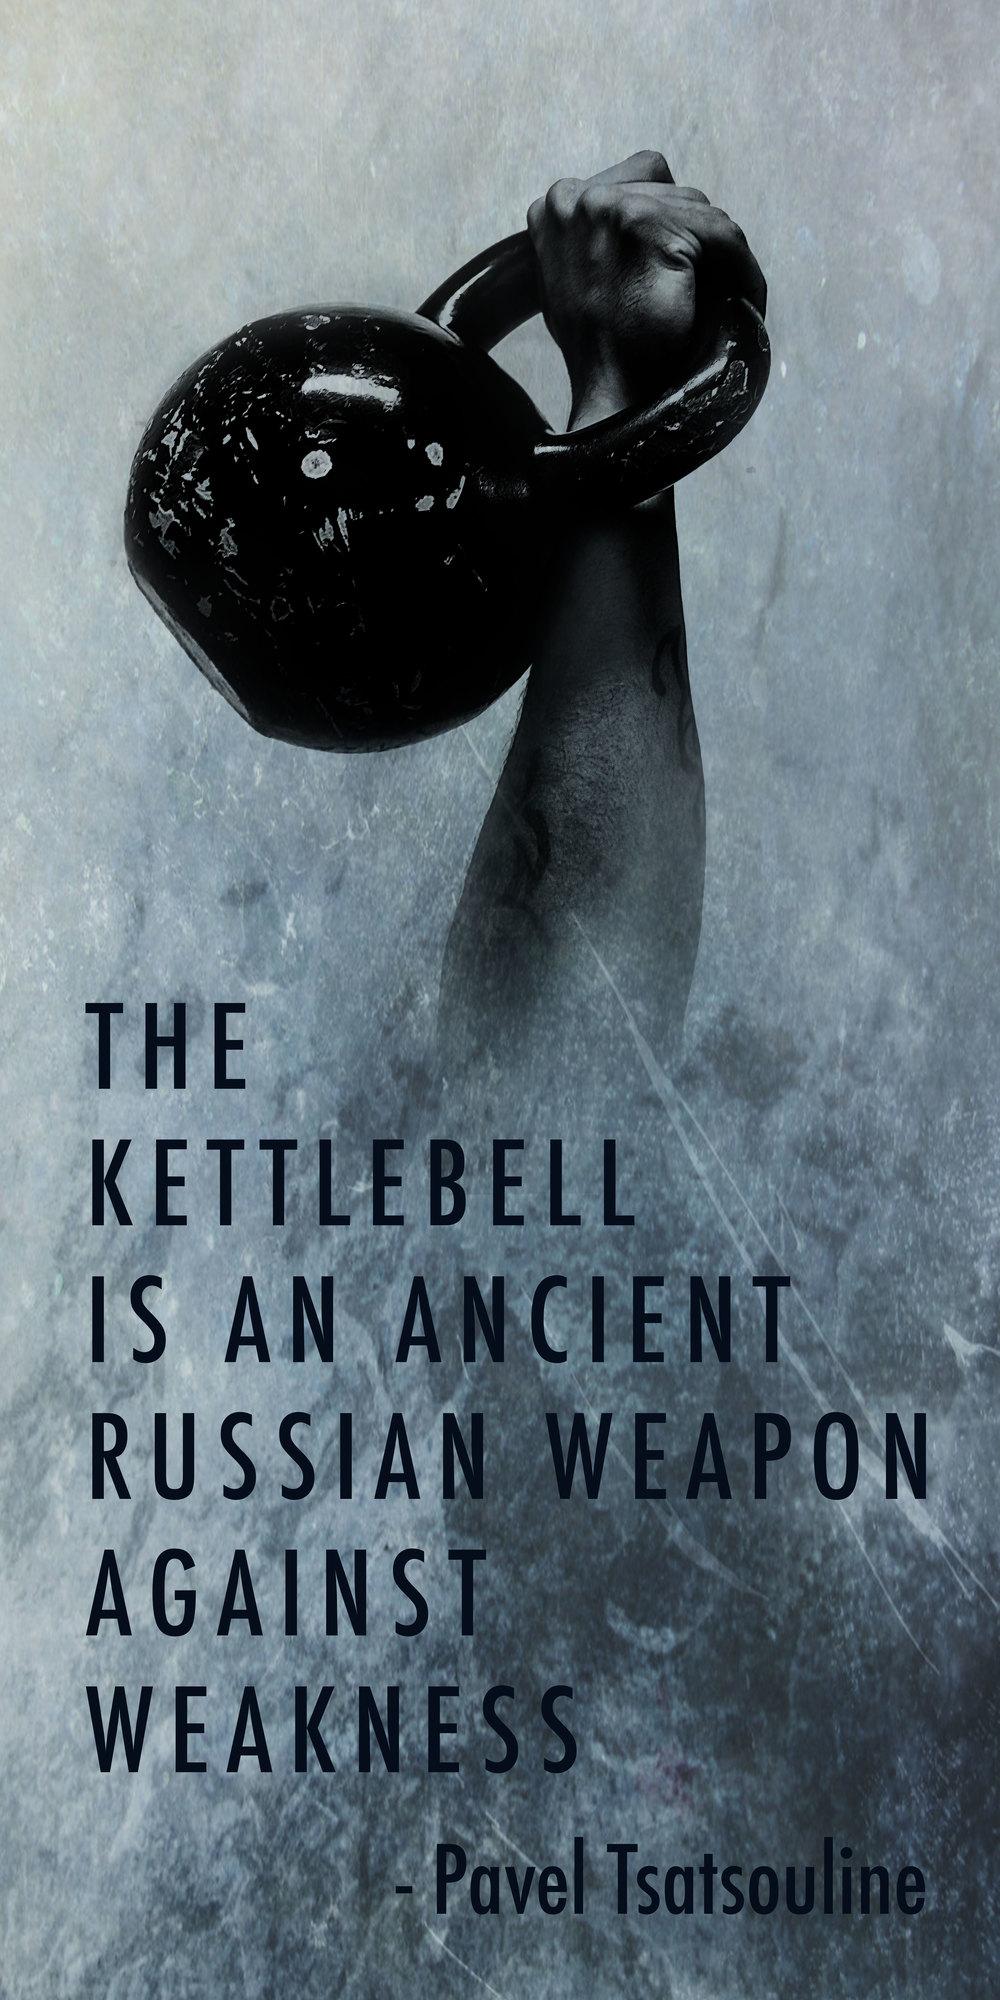 The Kettlebell